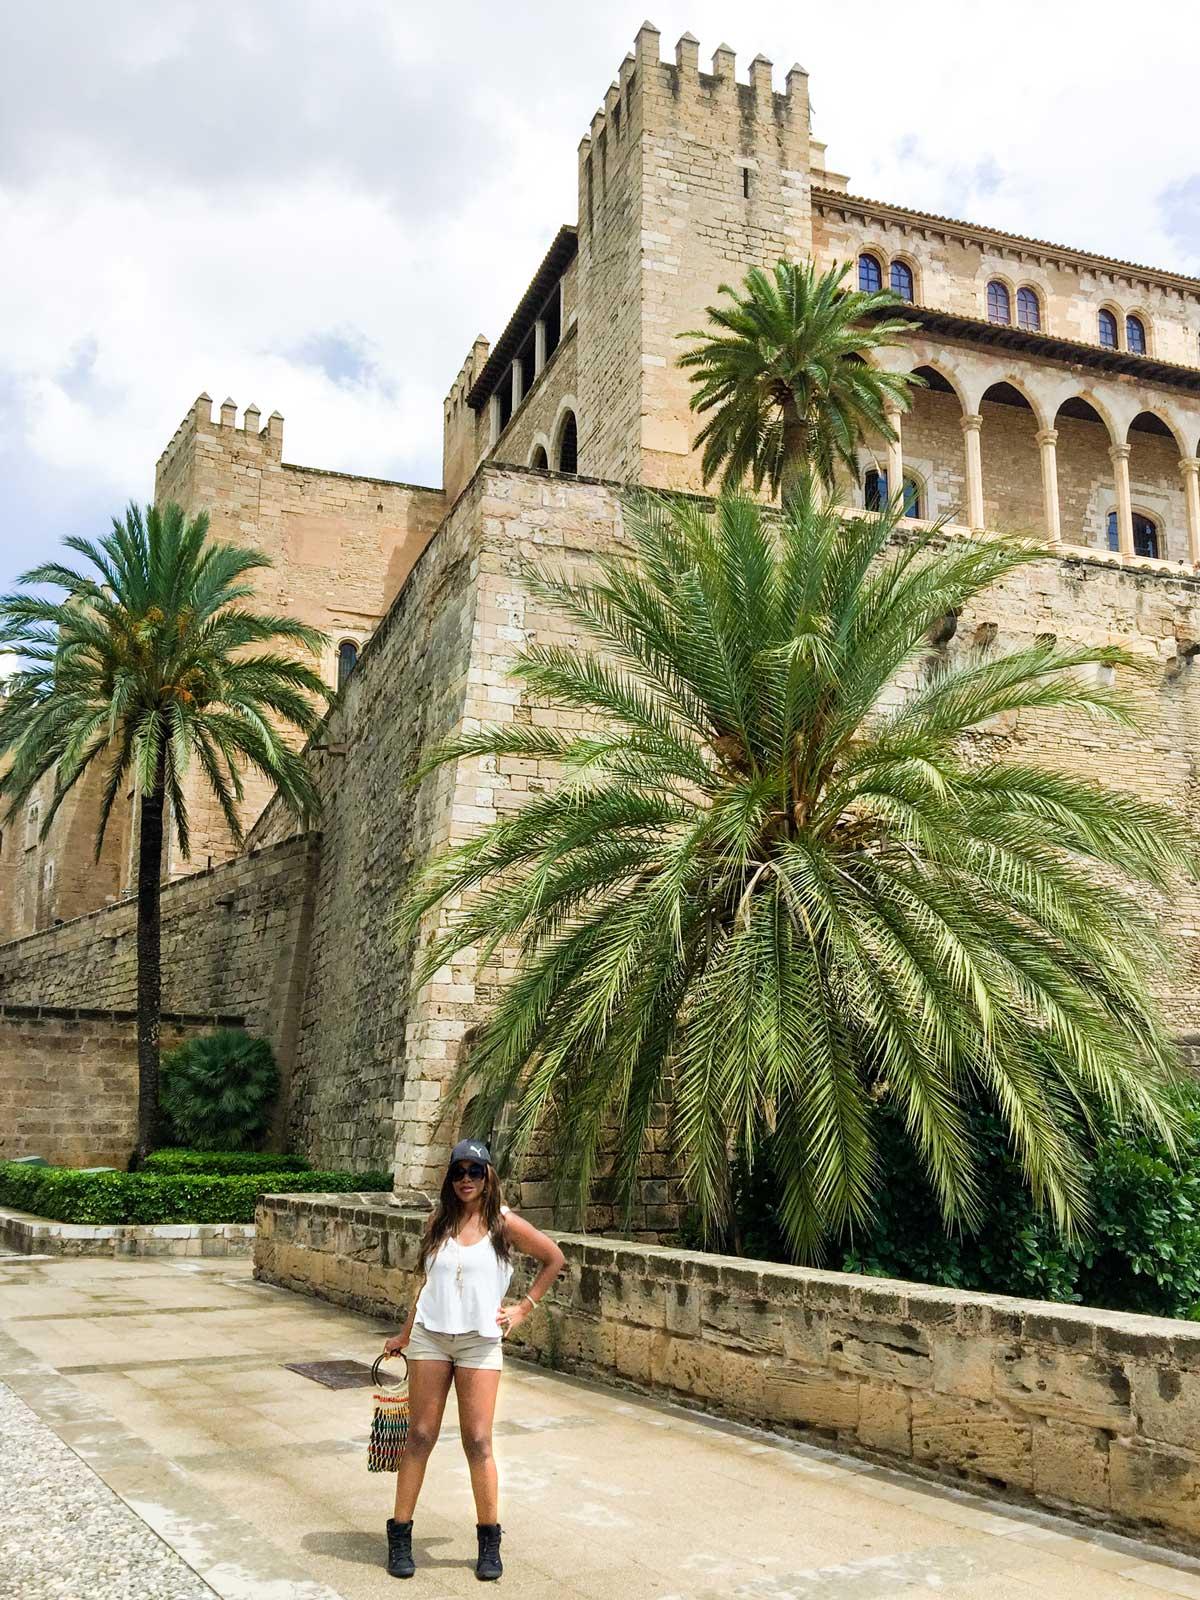 63 Things to do in Palma de Mallorca - Christobel Travel